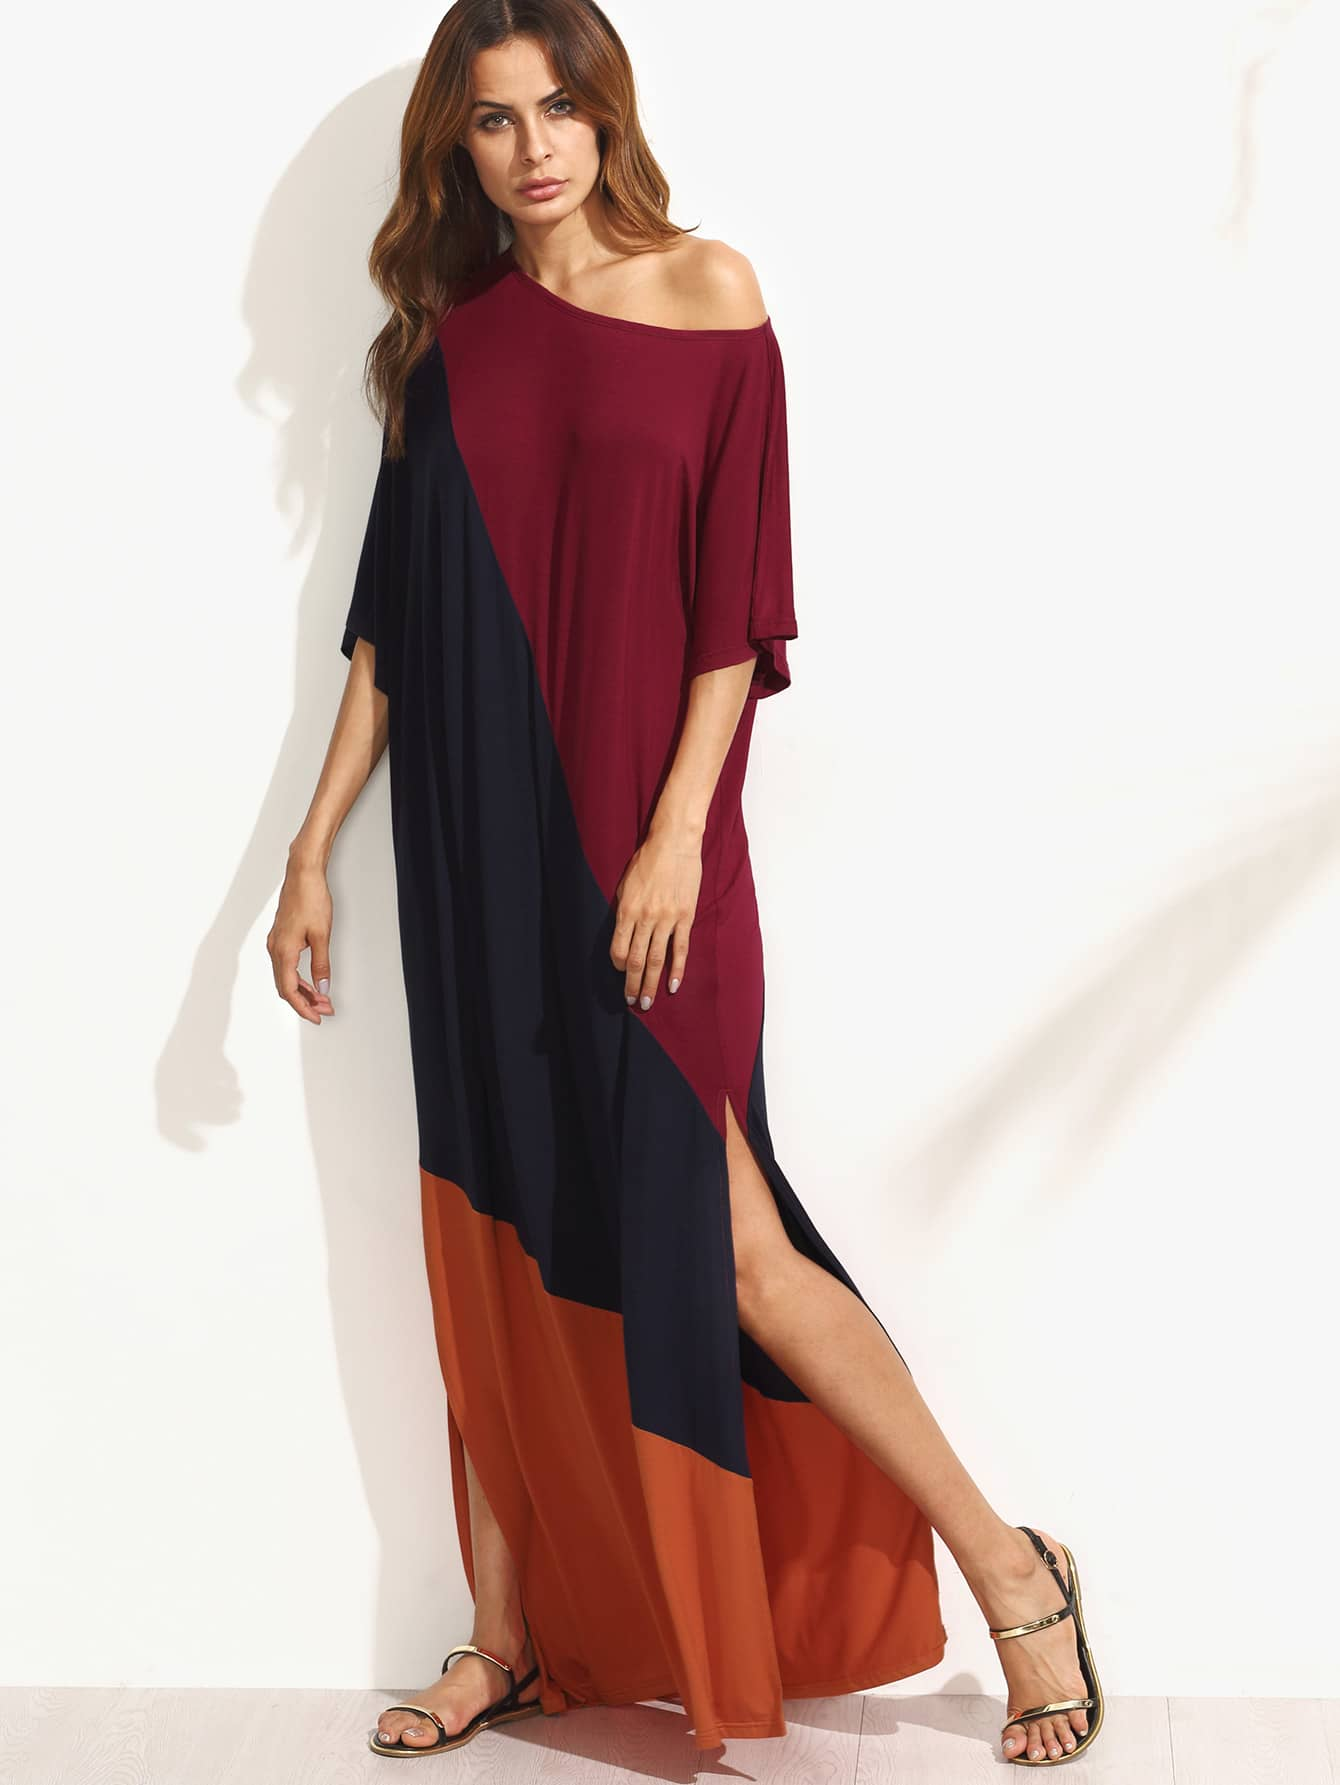 Color Block Split Side Maxi DressColor Block Split Side Maxi Dress<br><br>color: Multicolor<br>size: L,M,S,XS